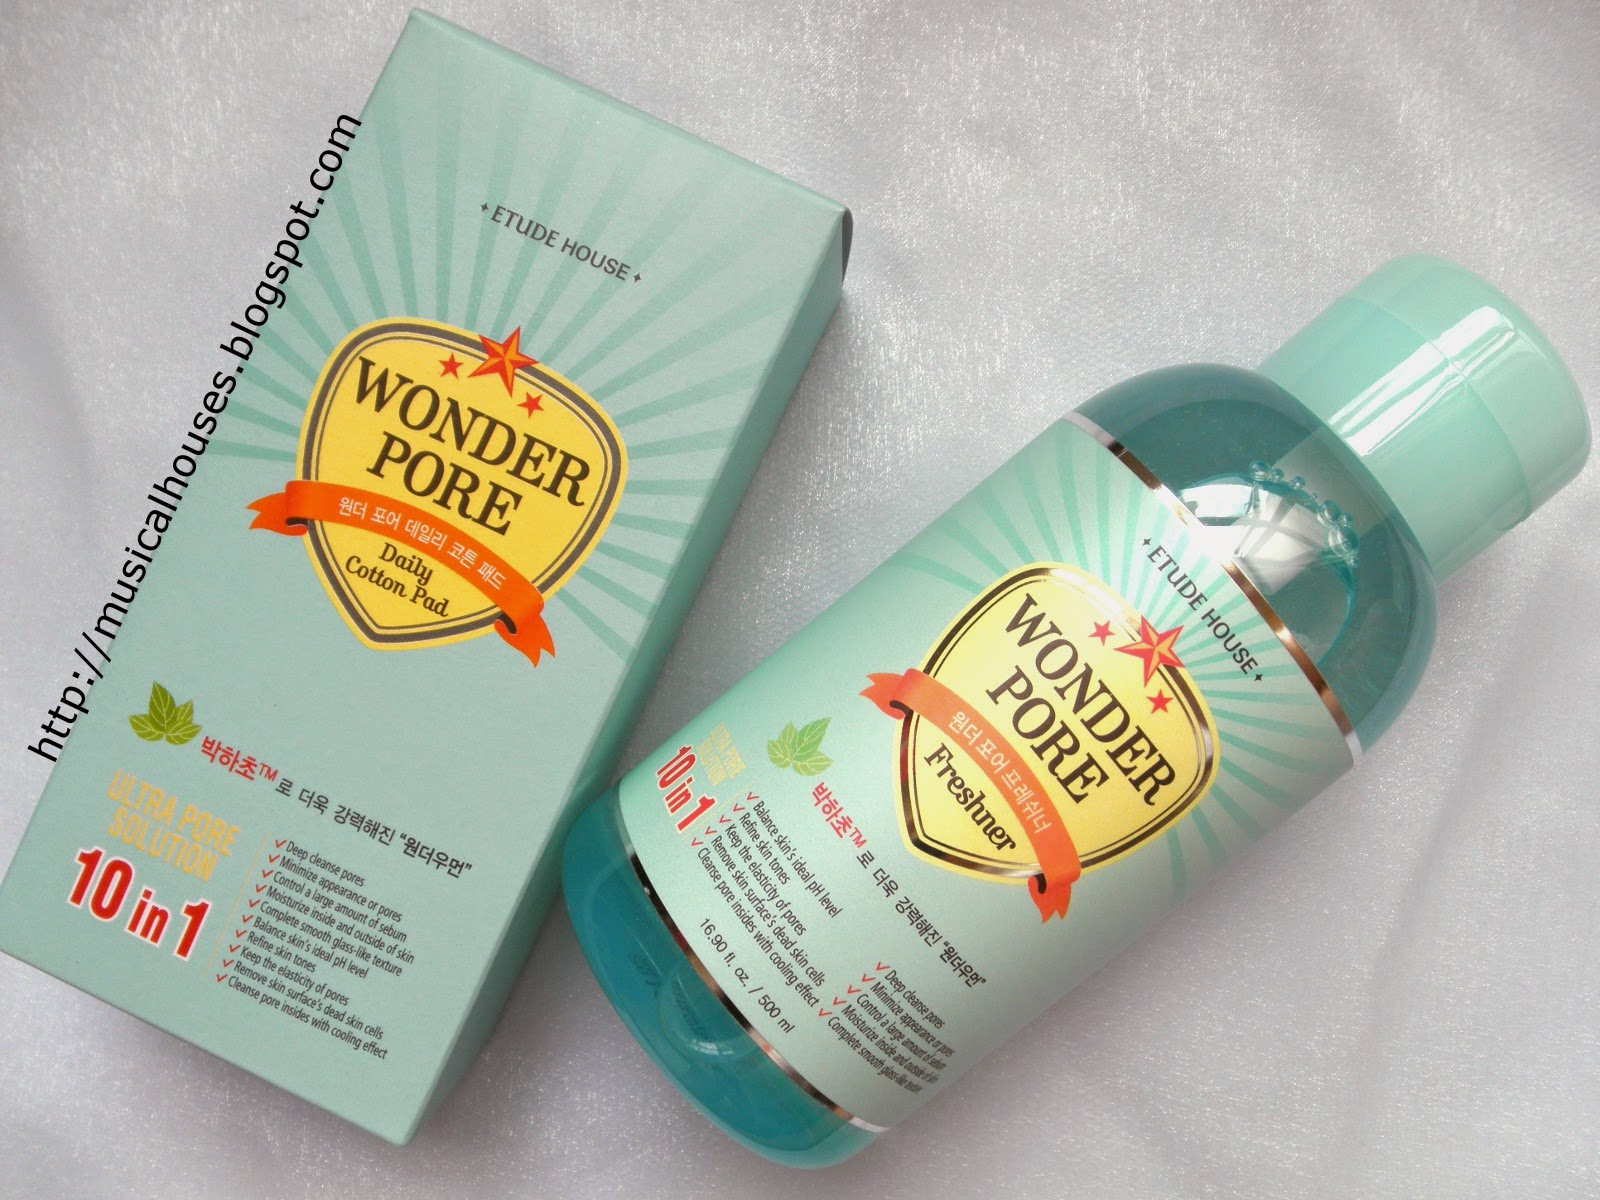 Etude House Wonder Pore Freshner Review And Ingredients Analysis